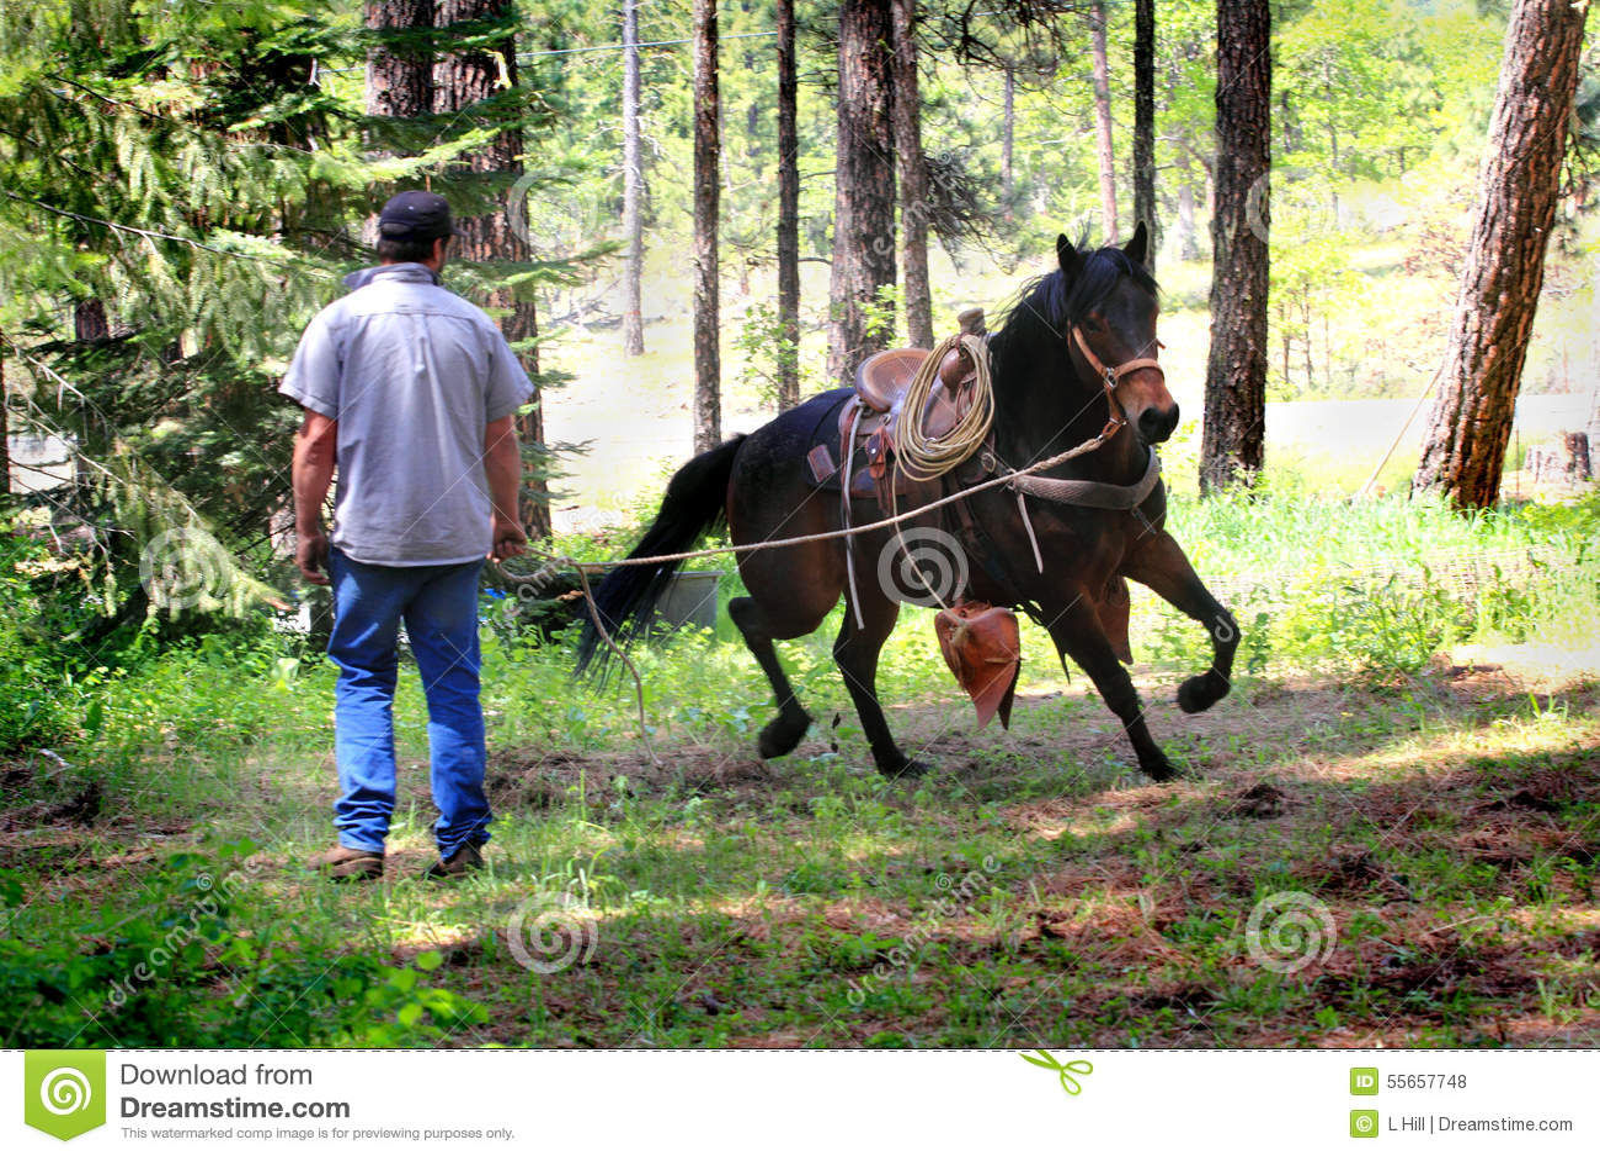 Cowboy Working Running Horse